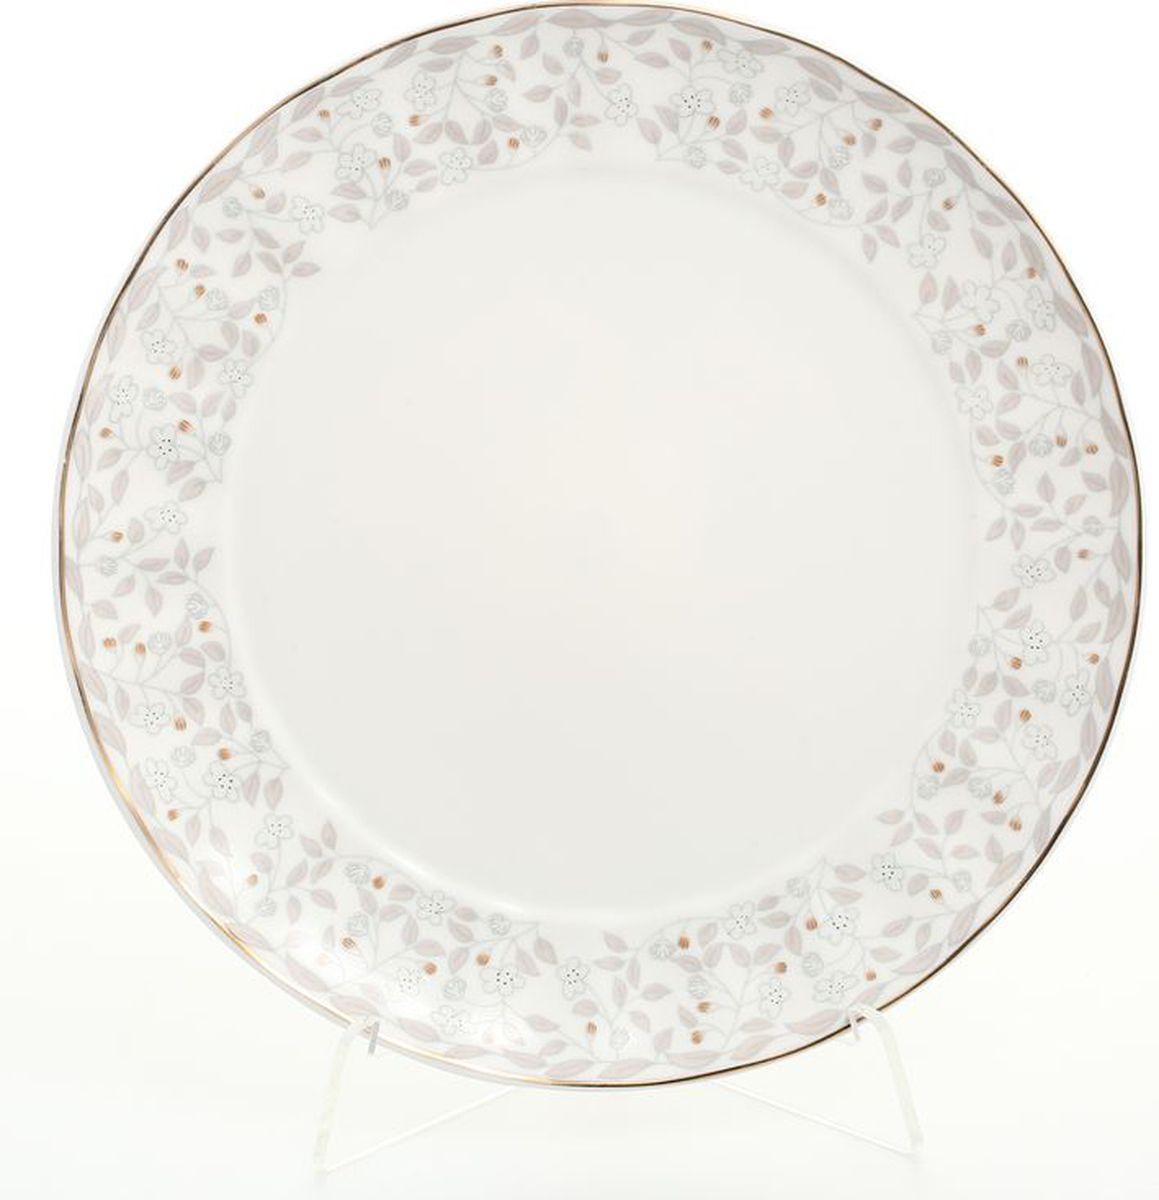 Тарелка Royal Classics, 35614, белый, диаметр 19 см, 6 шт